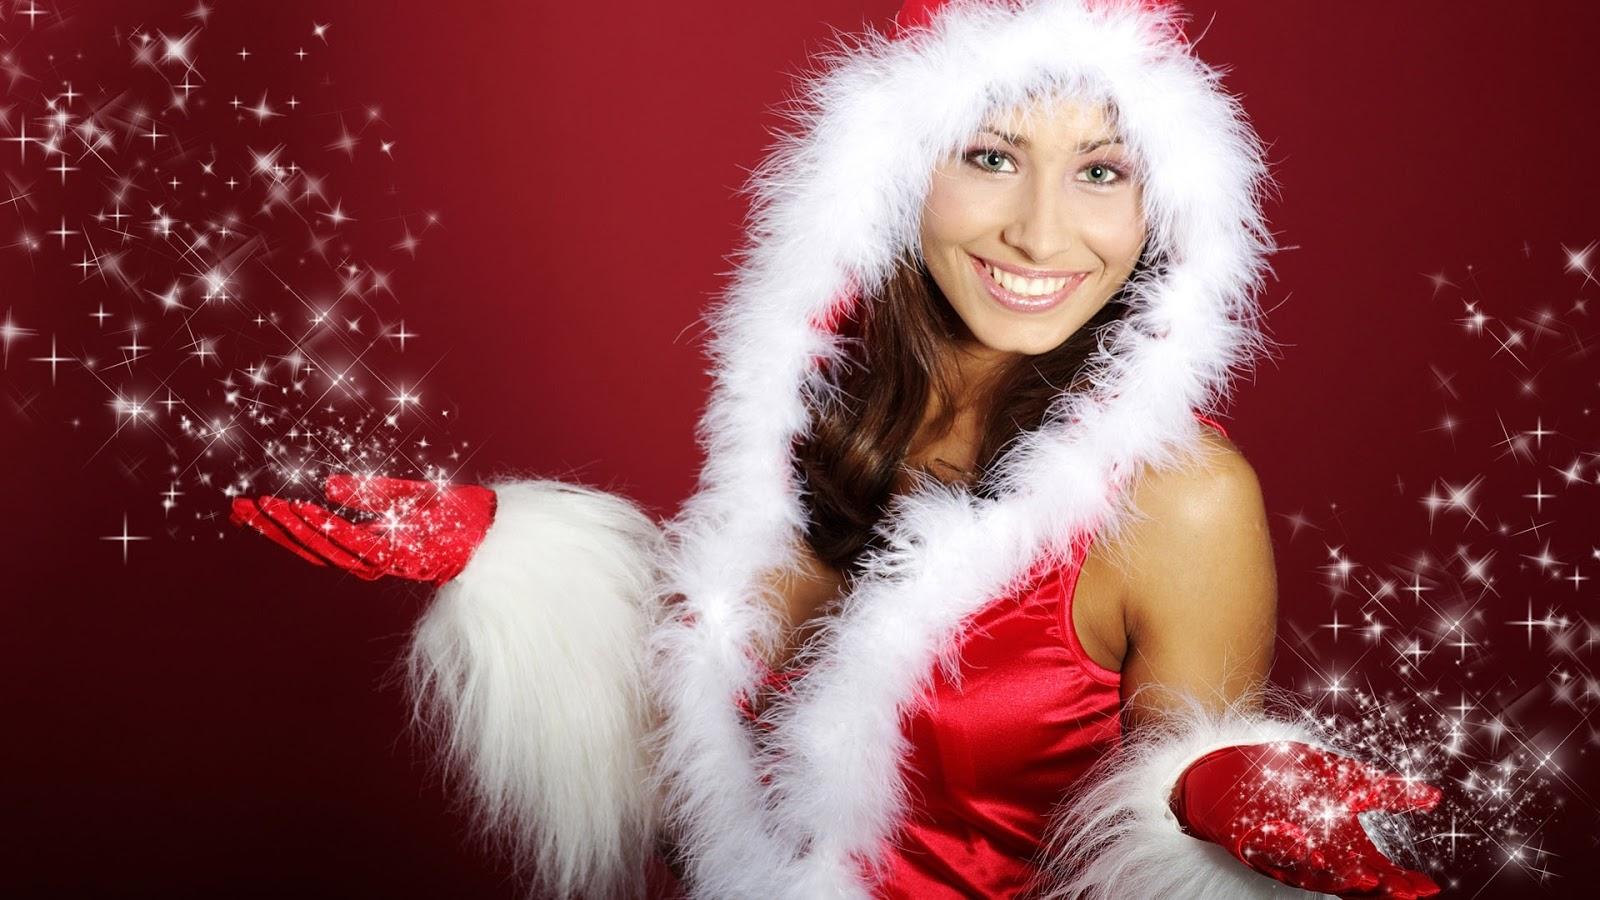 beautiful girls happy christmas wallpapers full hd